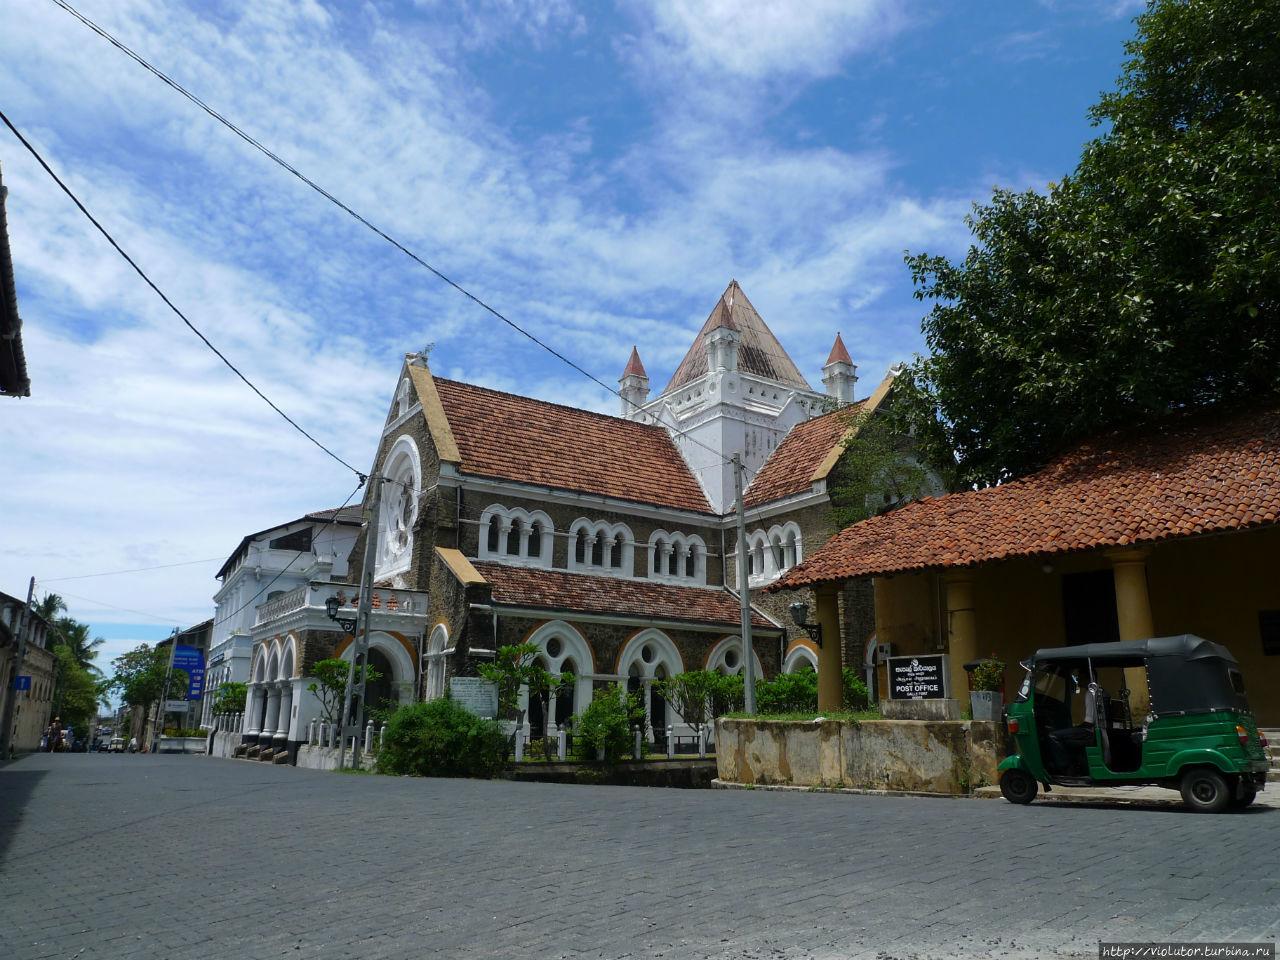 Форт Галле, солнце и очарование построек 17-го века Галле, Шри-Ланка